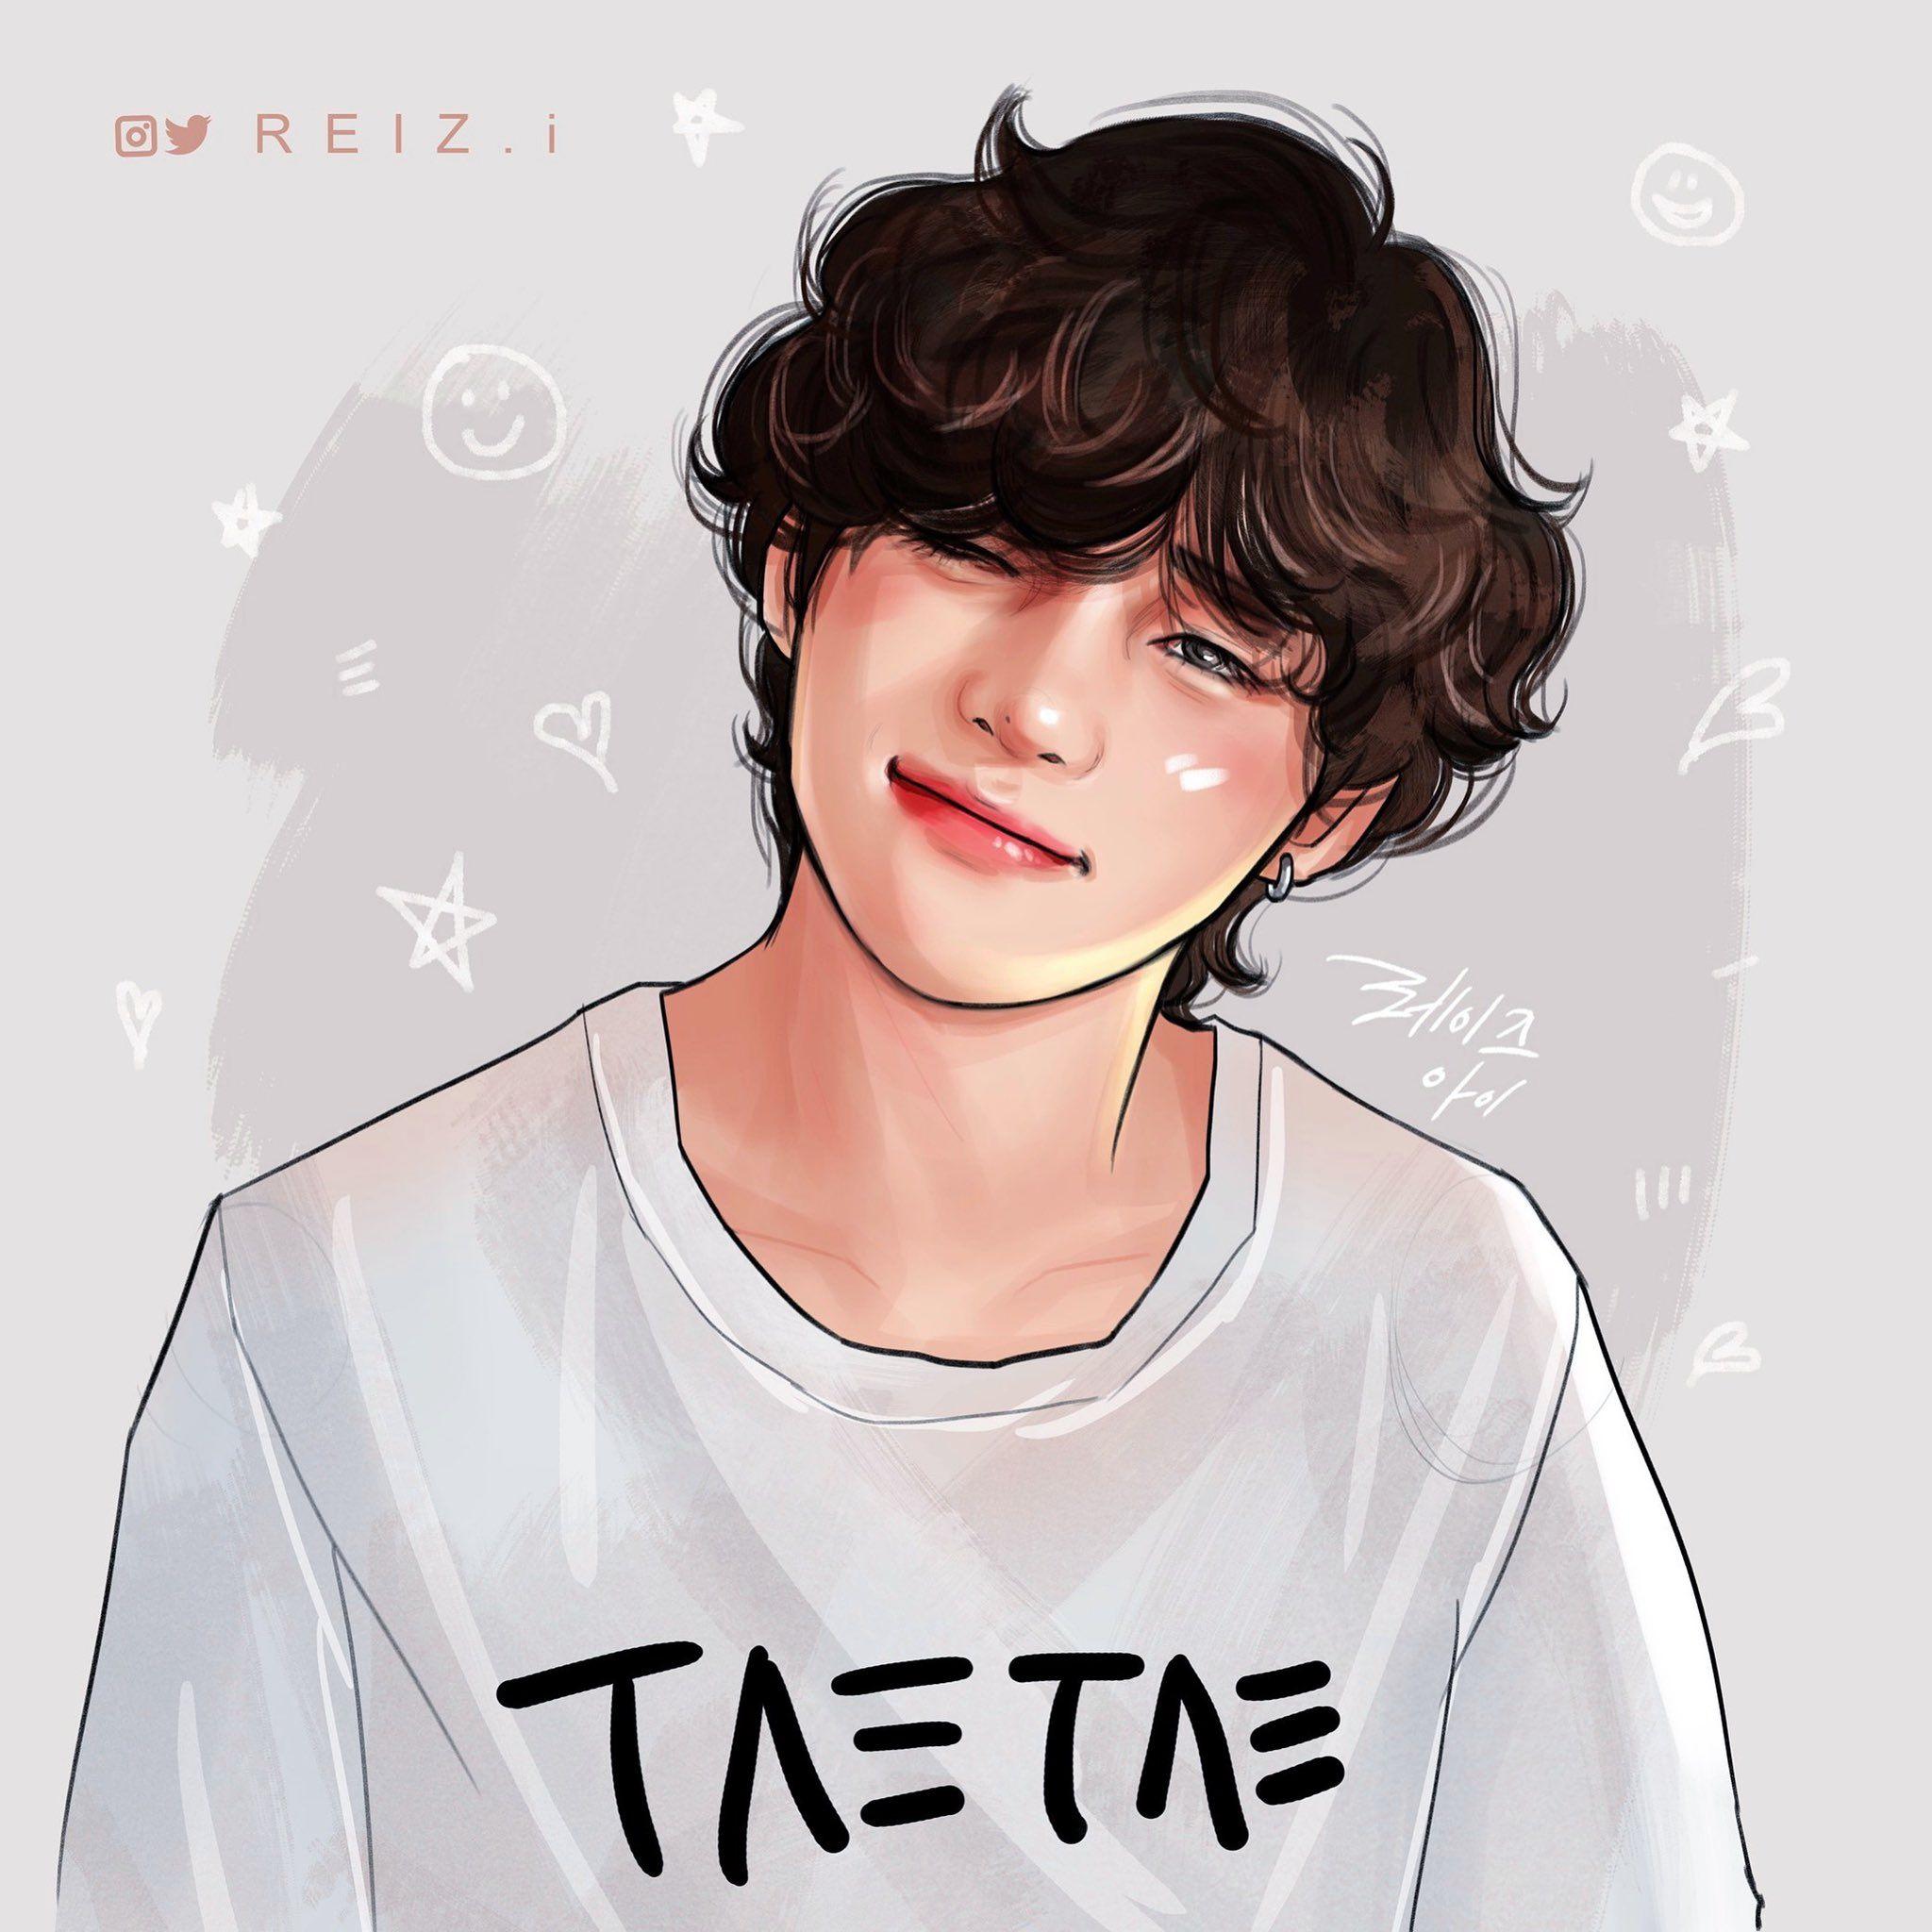 Reiz I On Twitter In 2020 Bts Drawings Bts Fanart Taehyung Fanart